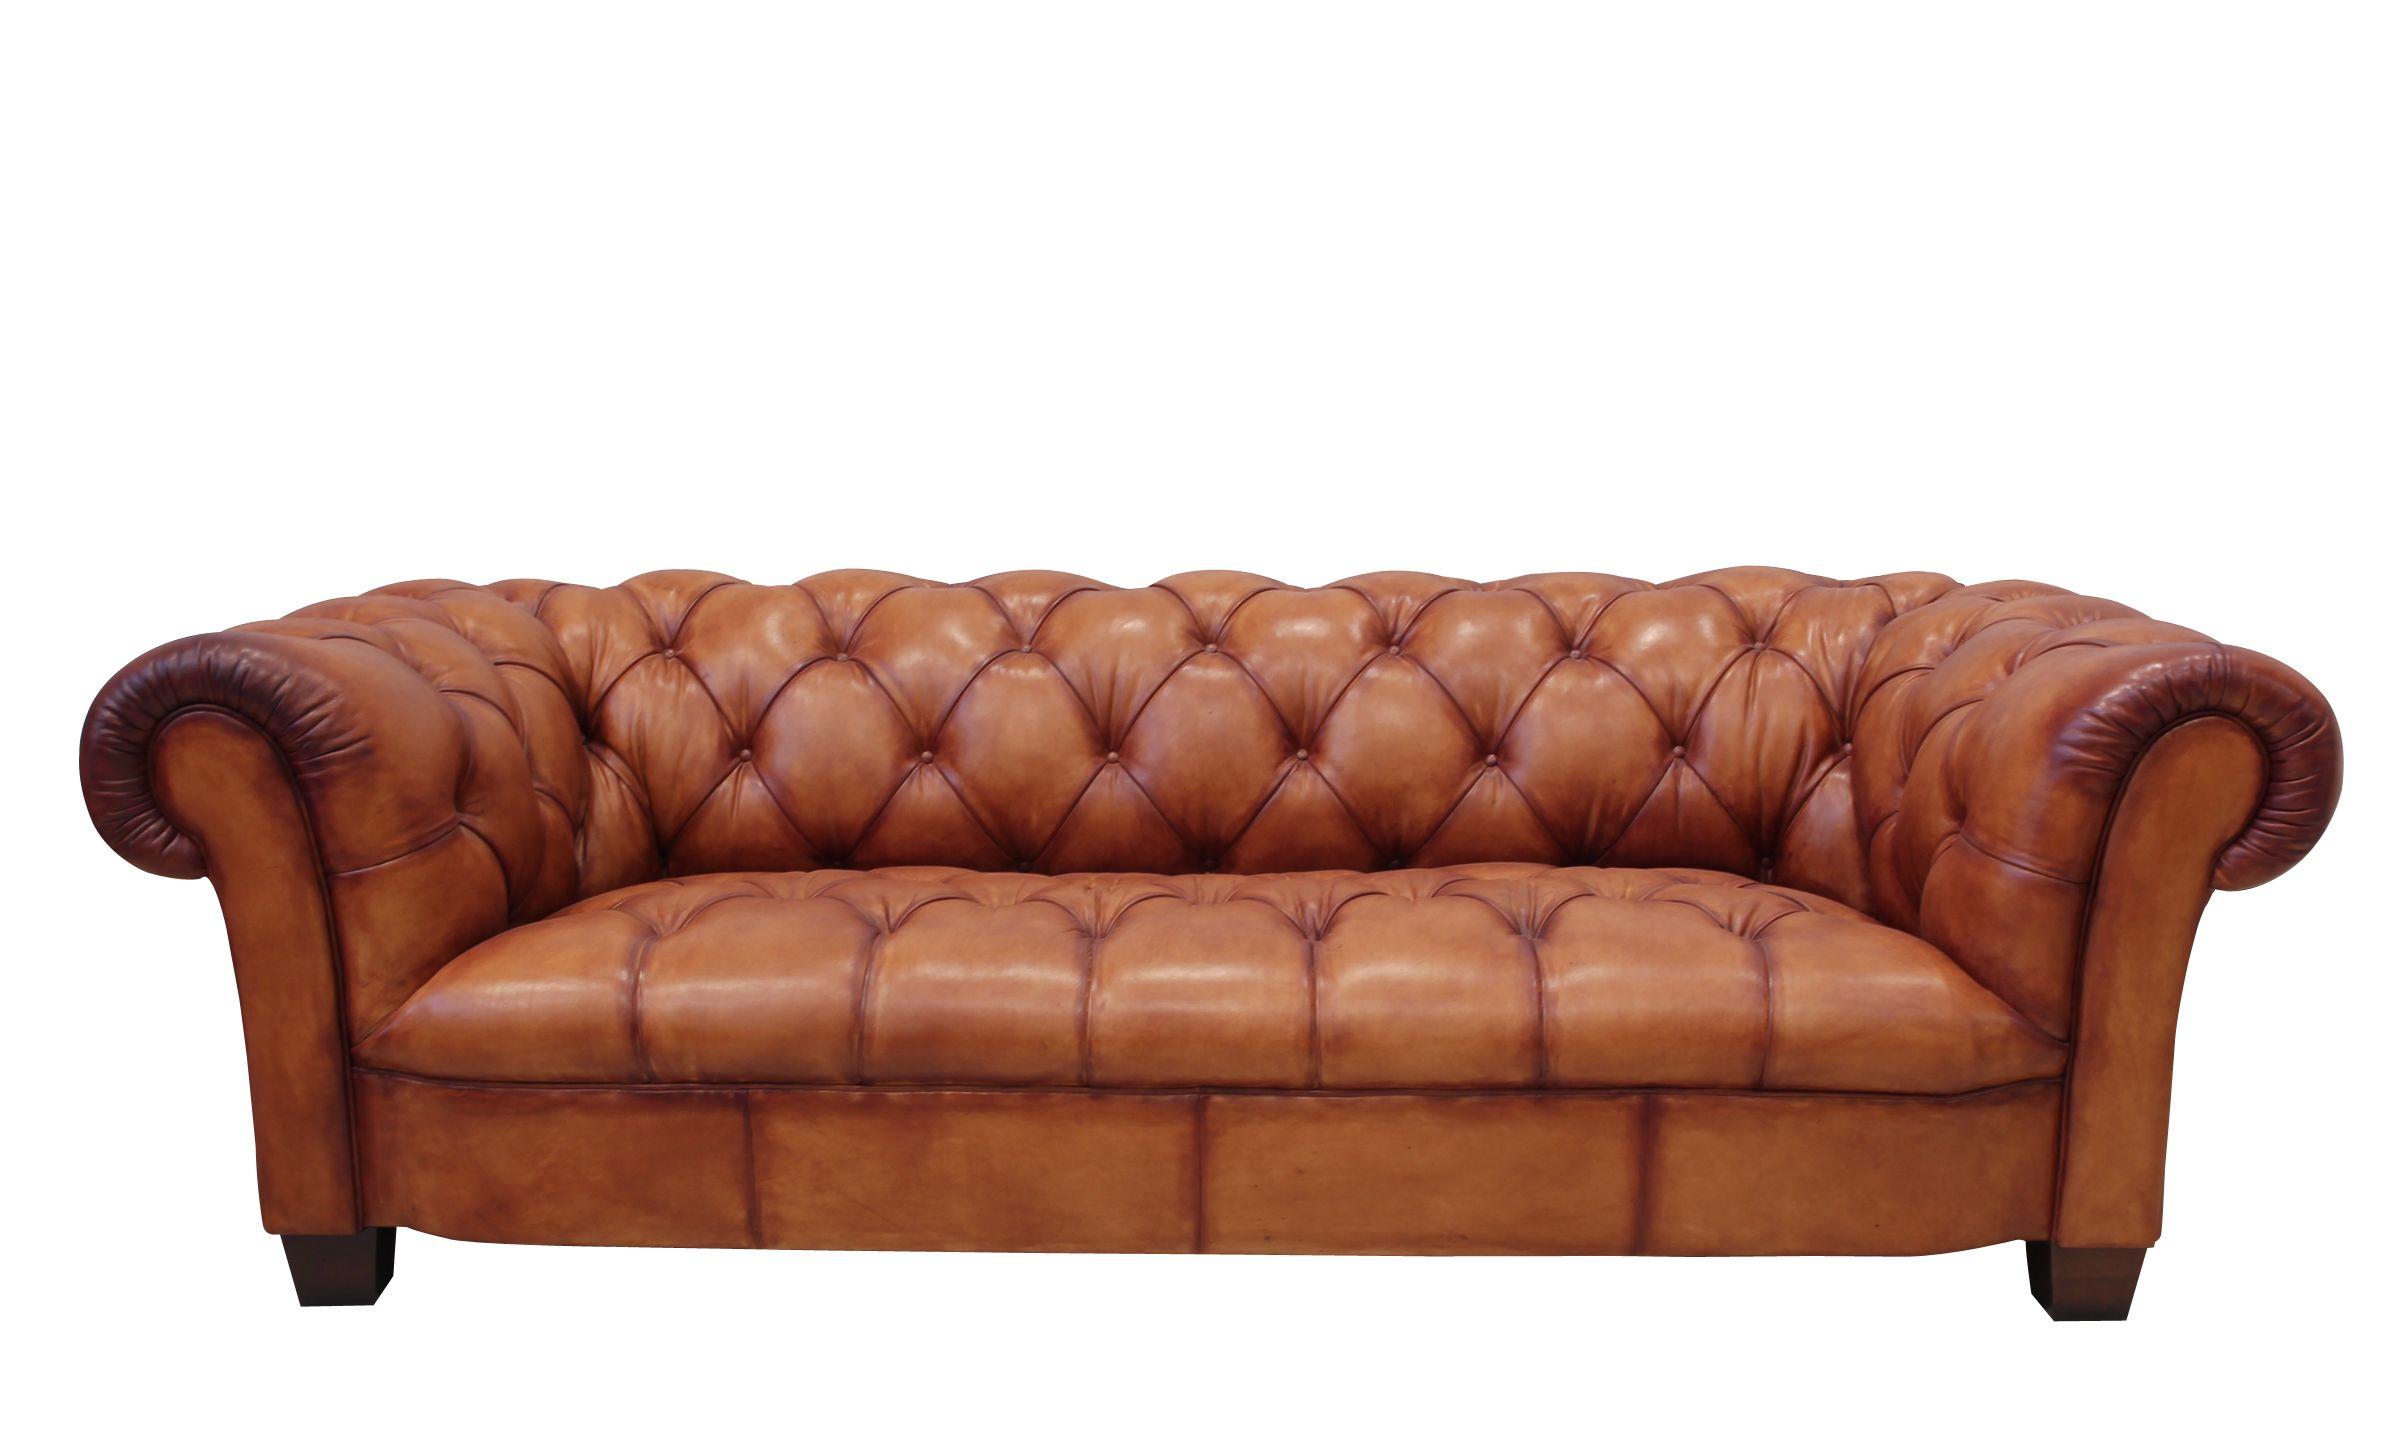 The Tetrad Elliott Leather Sofa - Chesterfield - Pinterest -